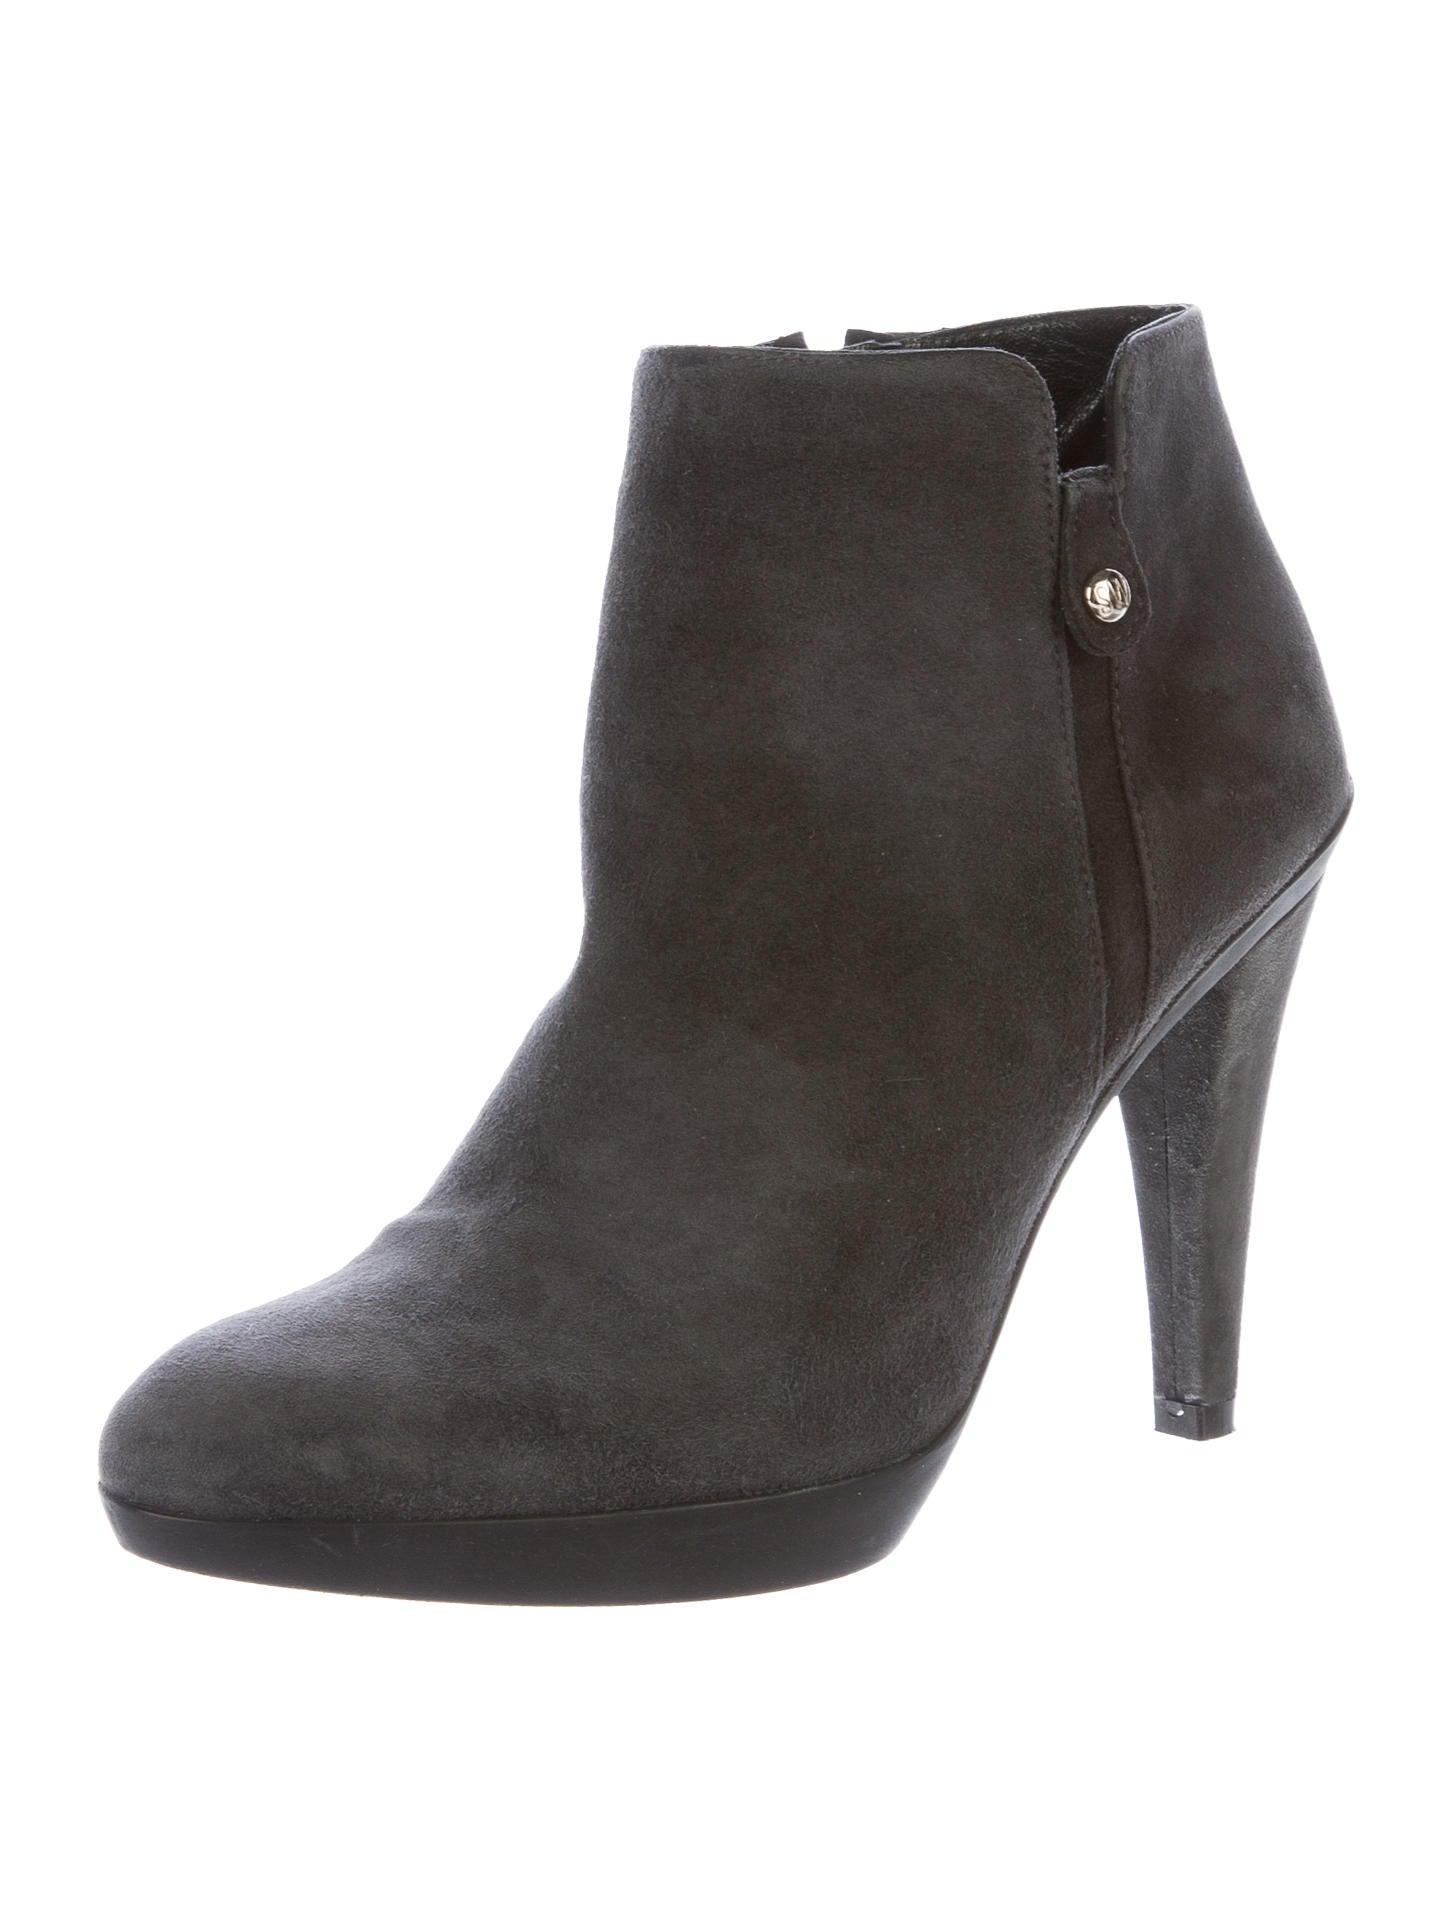 Stuart Weitzman Tablet Suede Ankle Boots Shoes